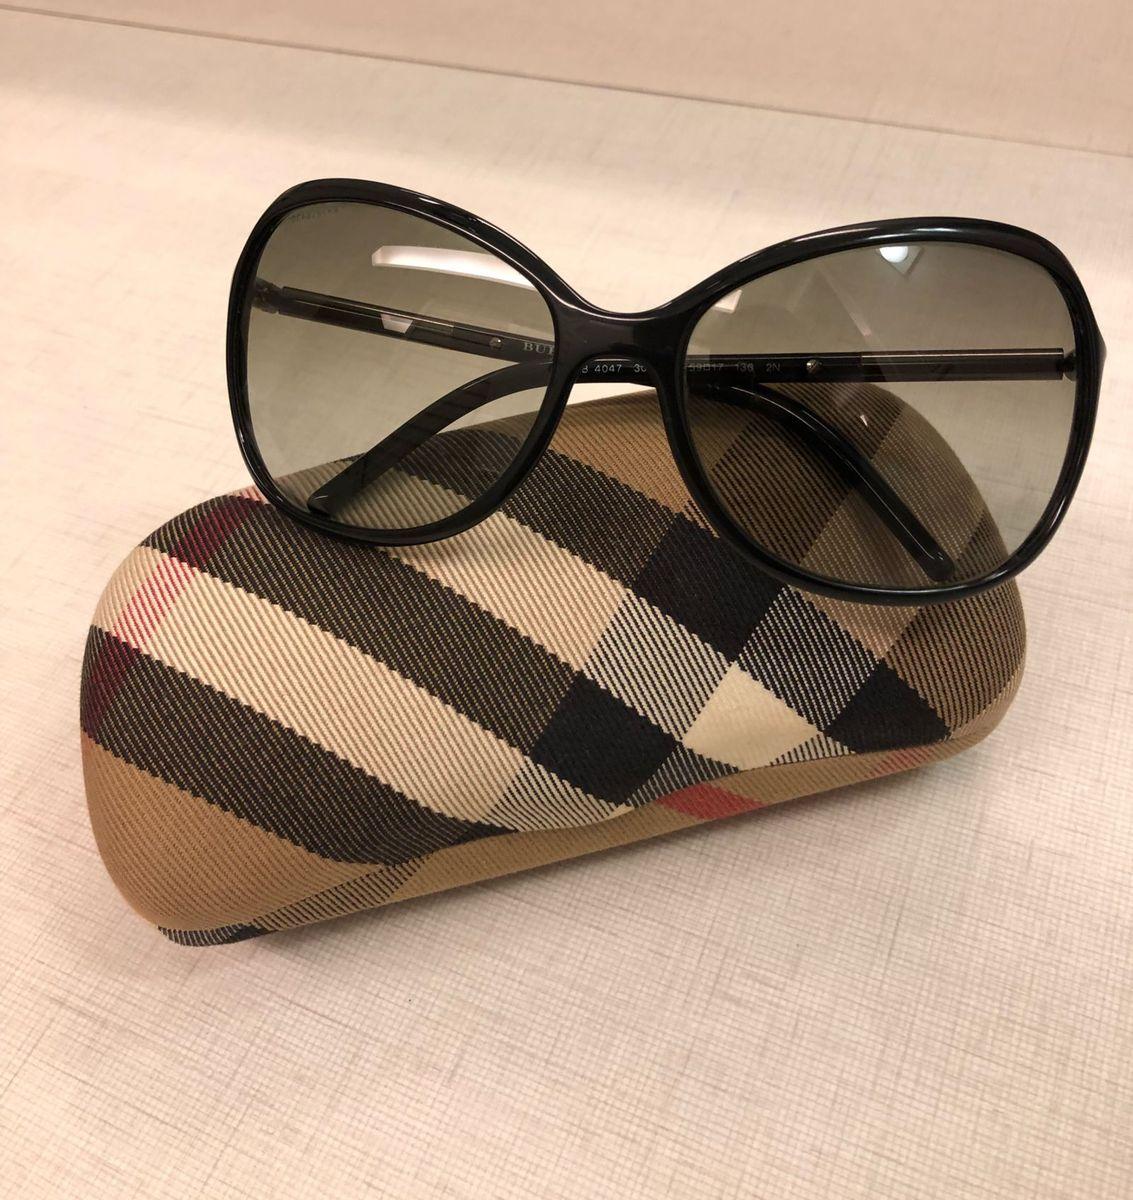 a38c67a1bd924 óculos de sol burberry - óculos burberry.  Czm6ly9wag90b3muzw5qb2vplmnvbs5ici9wcm9kdwn0cy8xmtqynji2lzdkzdjhoty5nwiymmfizjizownimdg3mdkxytllowrmlmpwzw  ...